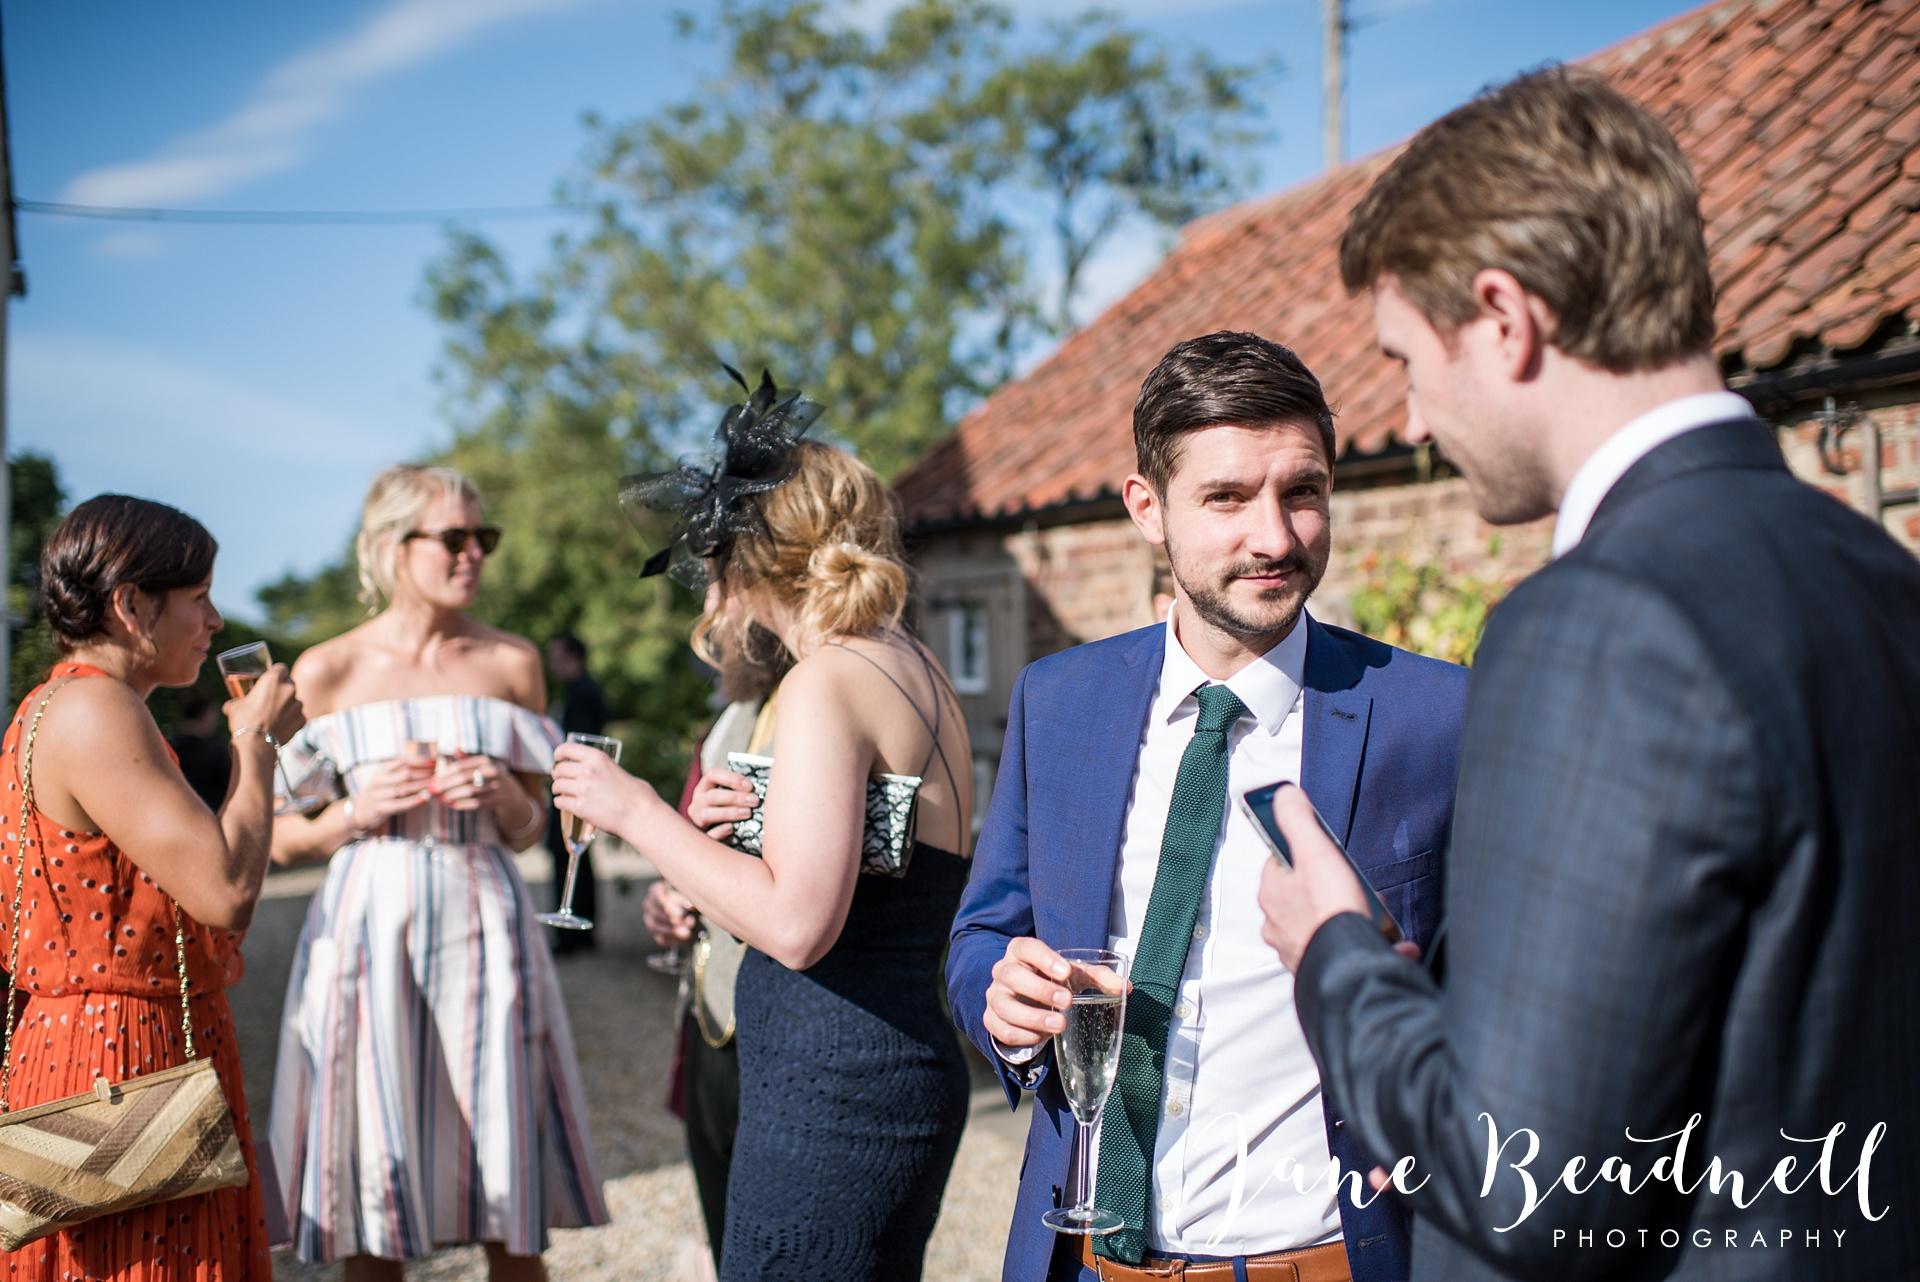 fine-art-wedding-photographer-jane-beadnell-yorkshire-wedding-photographer-garden-wedding_0077